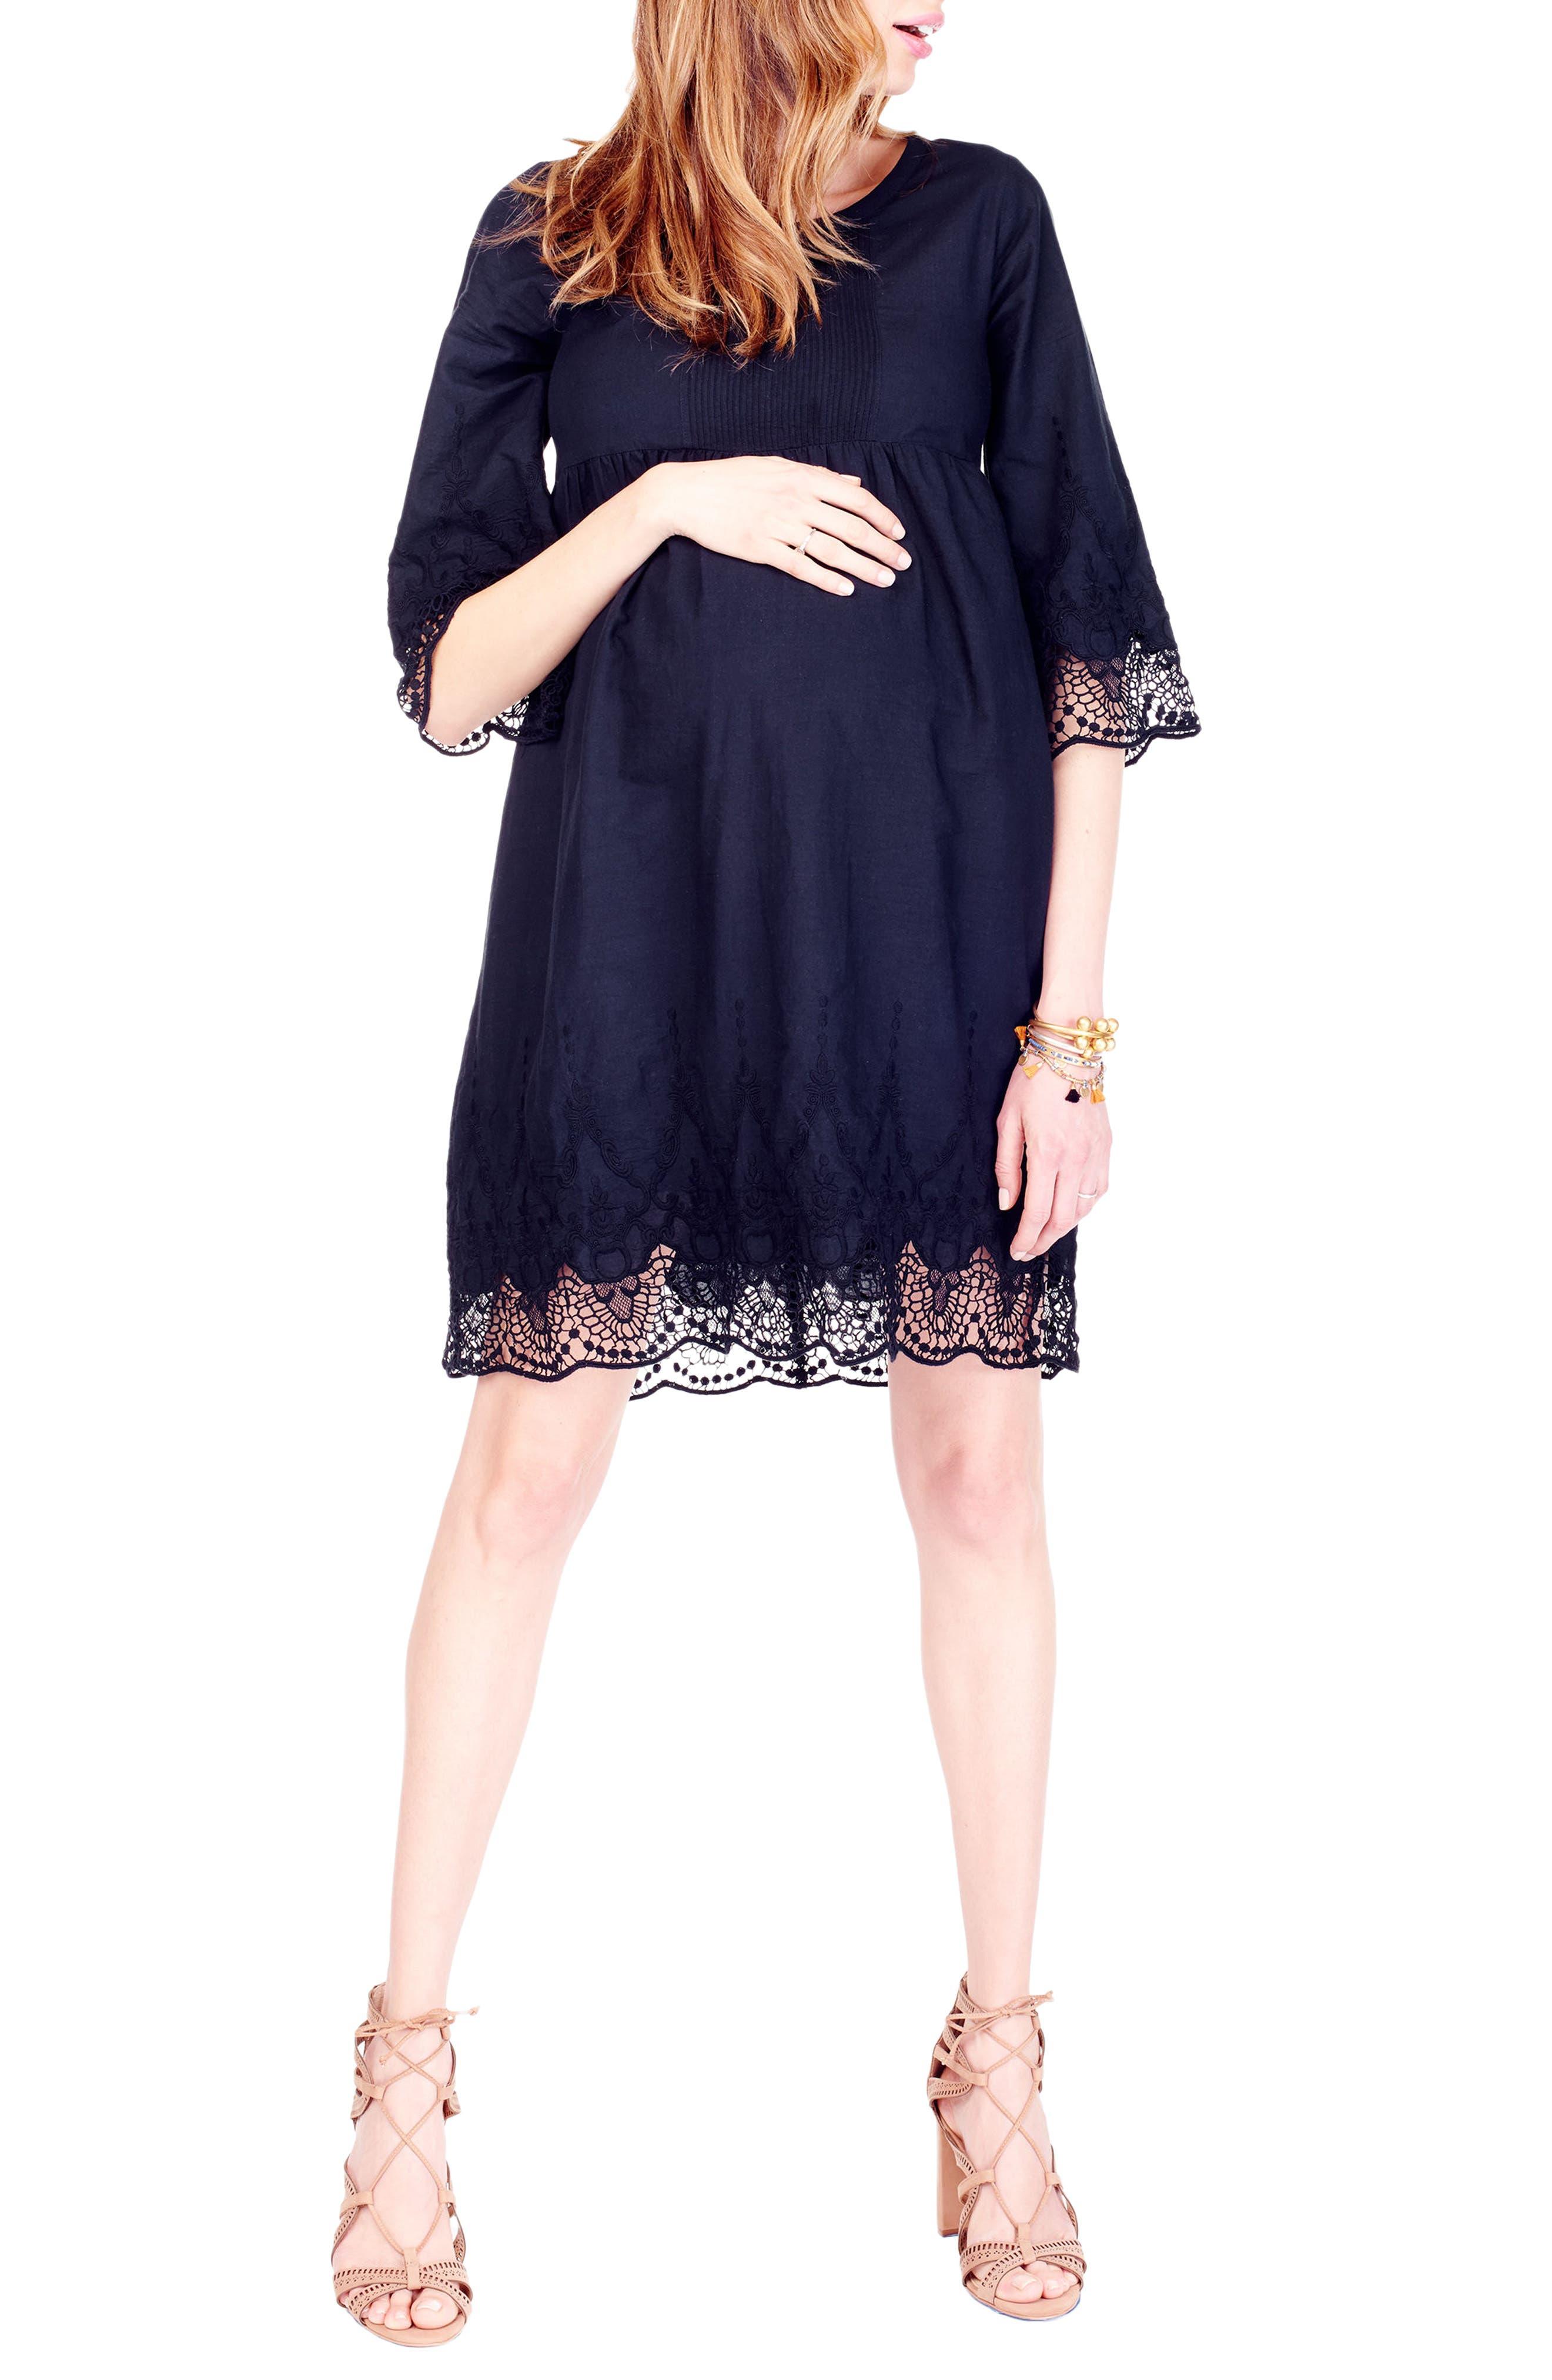 Lace Trim Maternity Dress,                             Main thumbnail 1, color,                             001